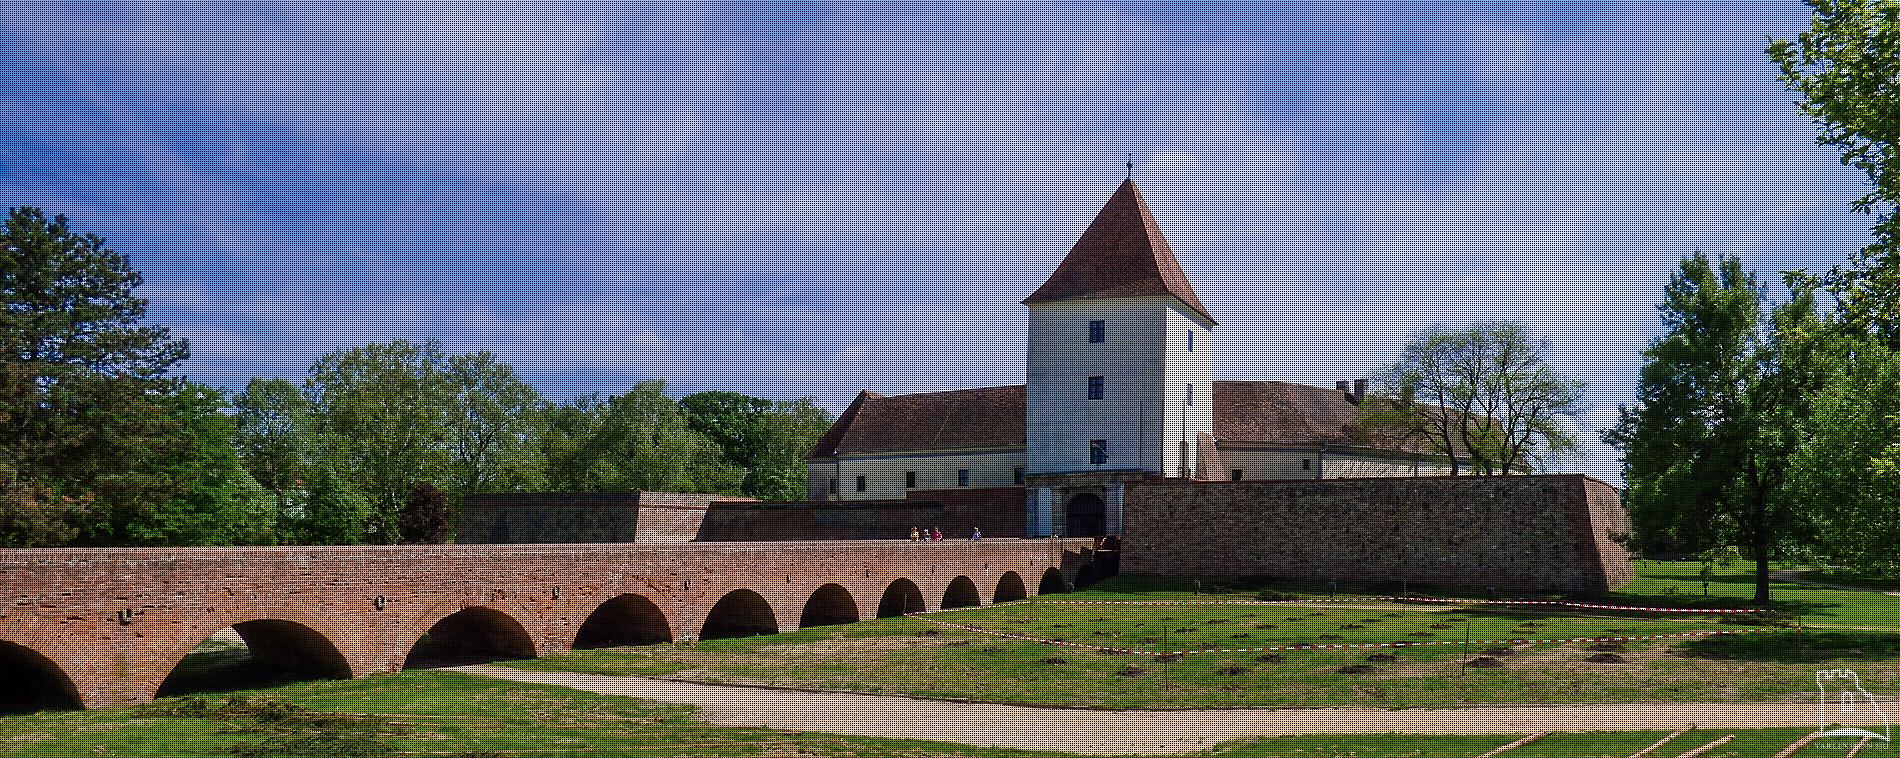 72e96ca9ae Sárvár - Magyar várak, kastélyok, templomok leírásai, galériái